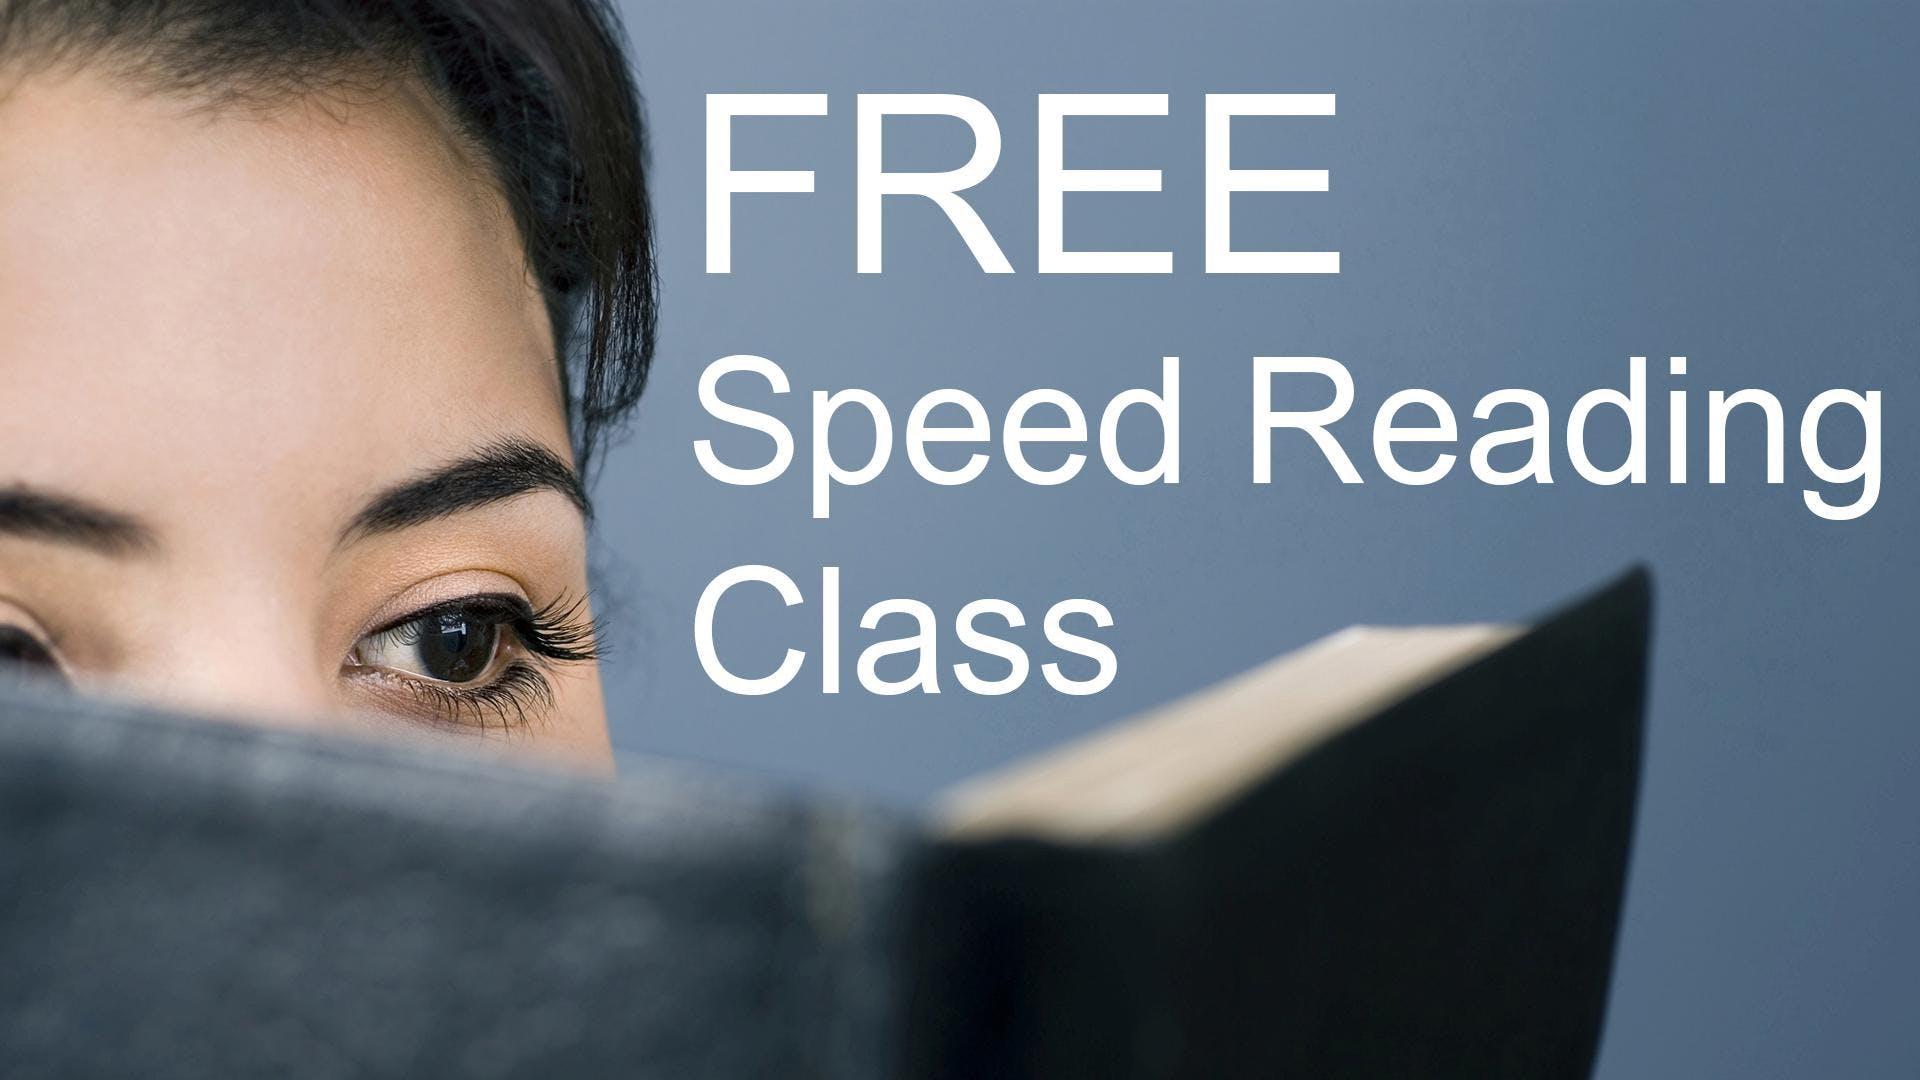 Free Speed Reading Class - Tulsa